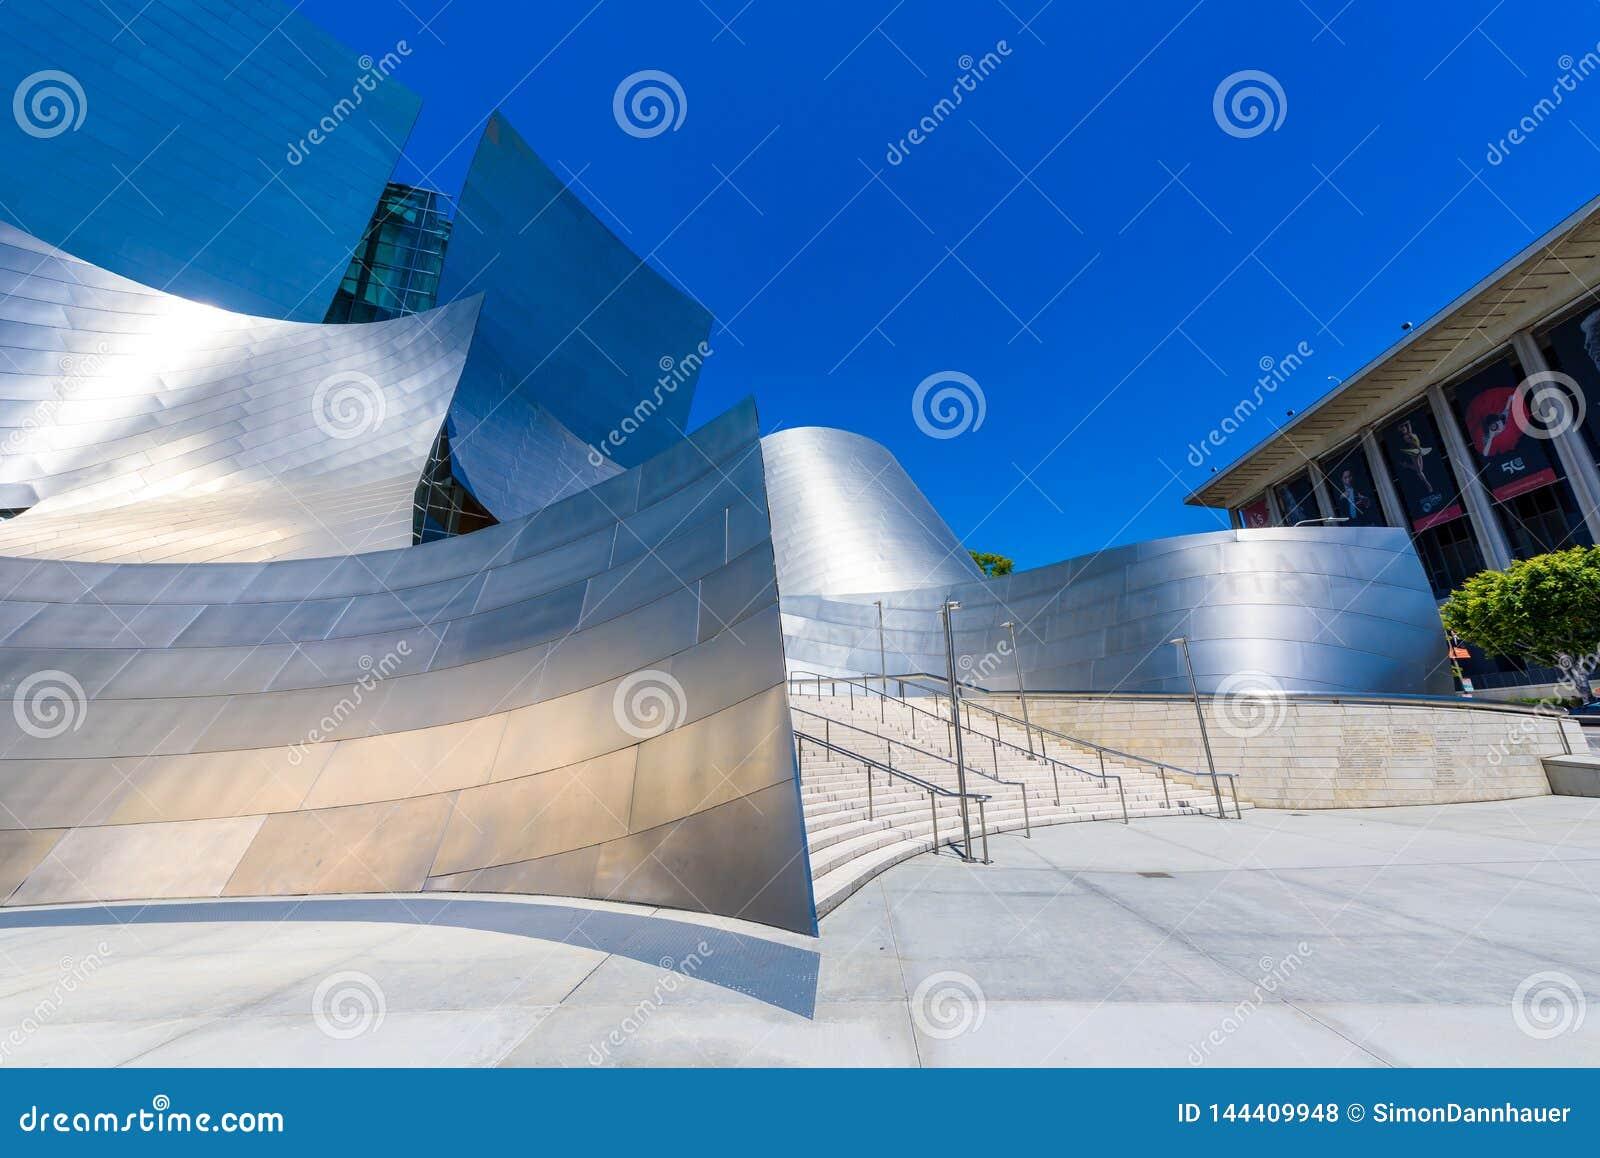 LOS ANGELES, California, U.S.A. - 13 giugno 2017: Walt Disney Concert Hall a Los Angeles del centro progettato da Frank Gehry, ca